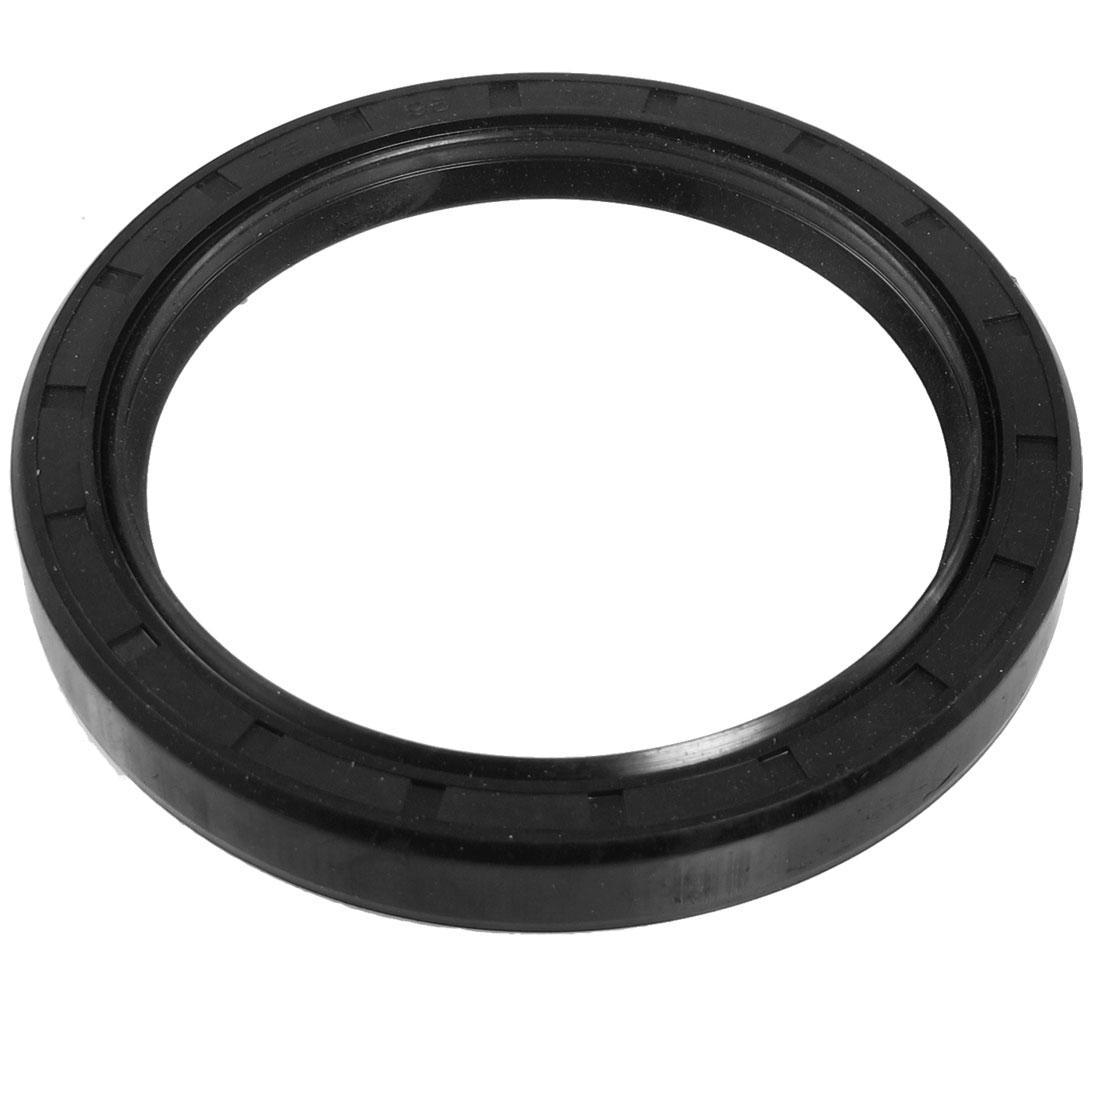 Black Nitrile Rubber Dual Lips Oil Shaft Seal TC 75mm x 95mm x 12mm